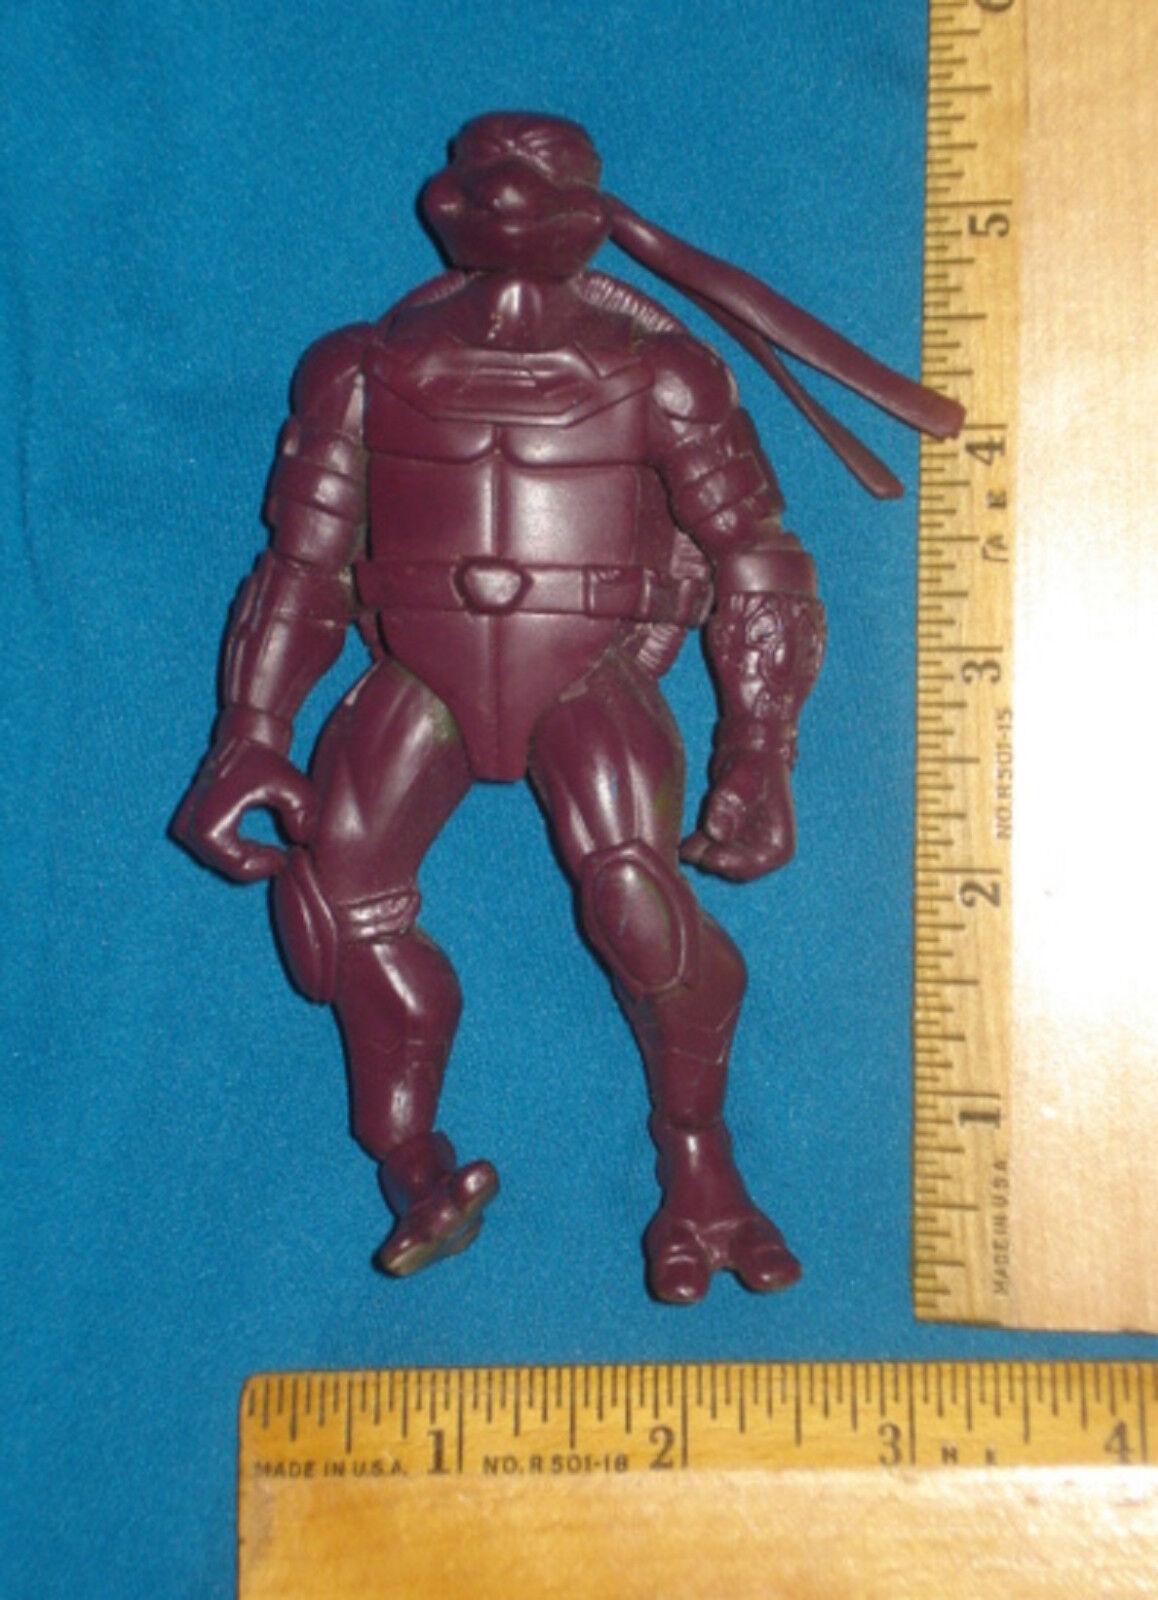 Prototyp   farbe stichprobe tmnt mutant hero turtles vorspulen oder donatello ts